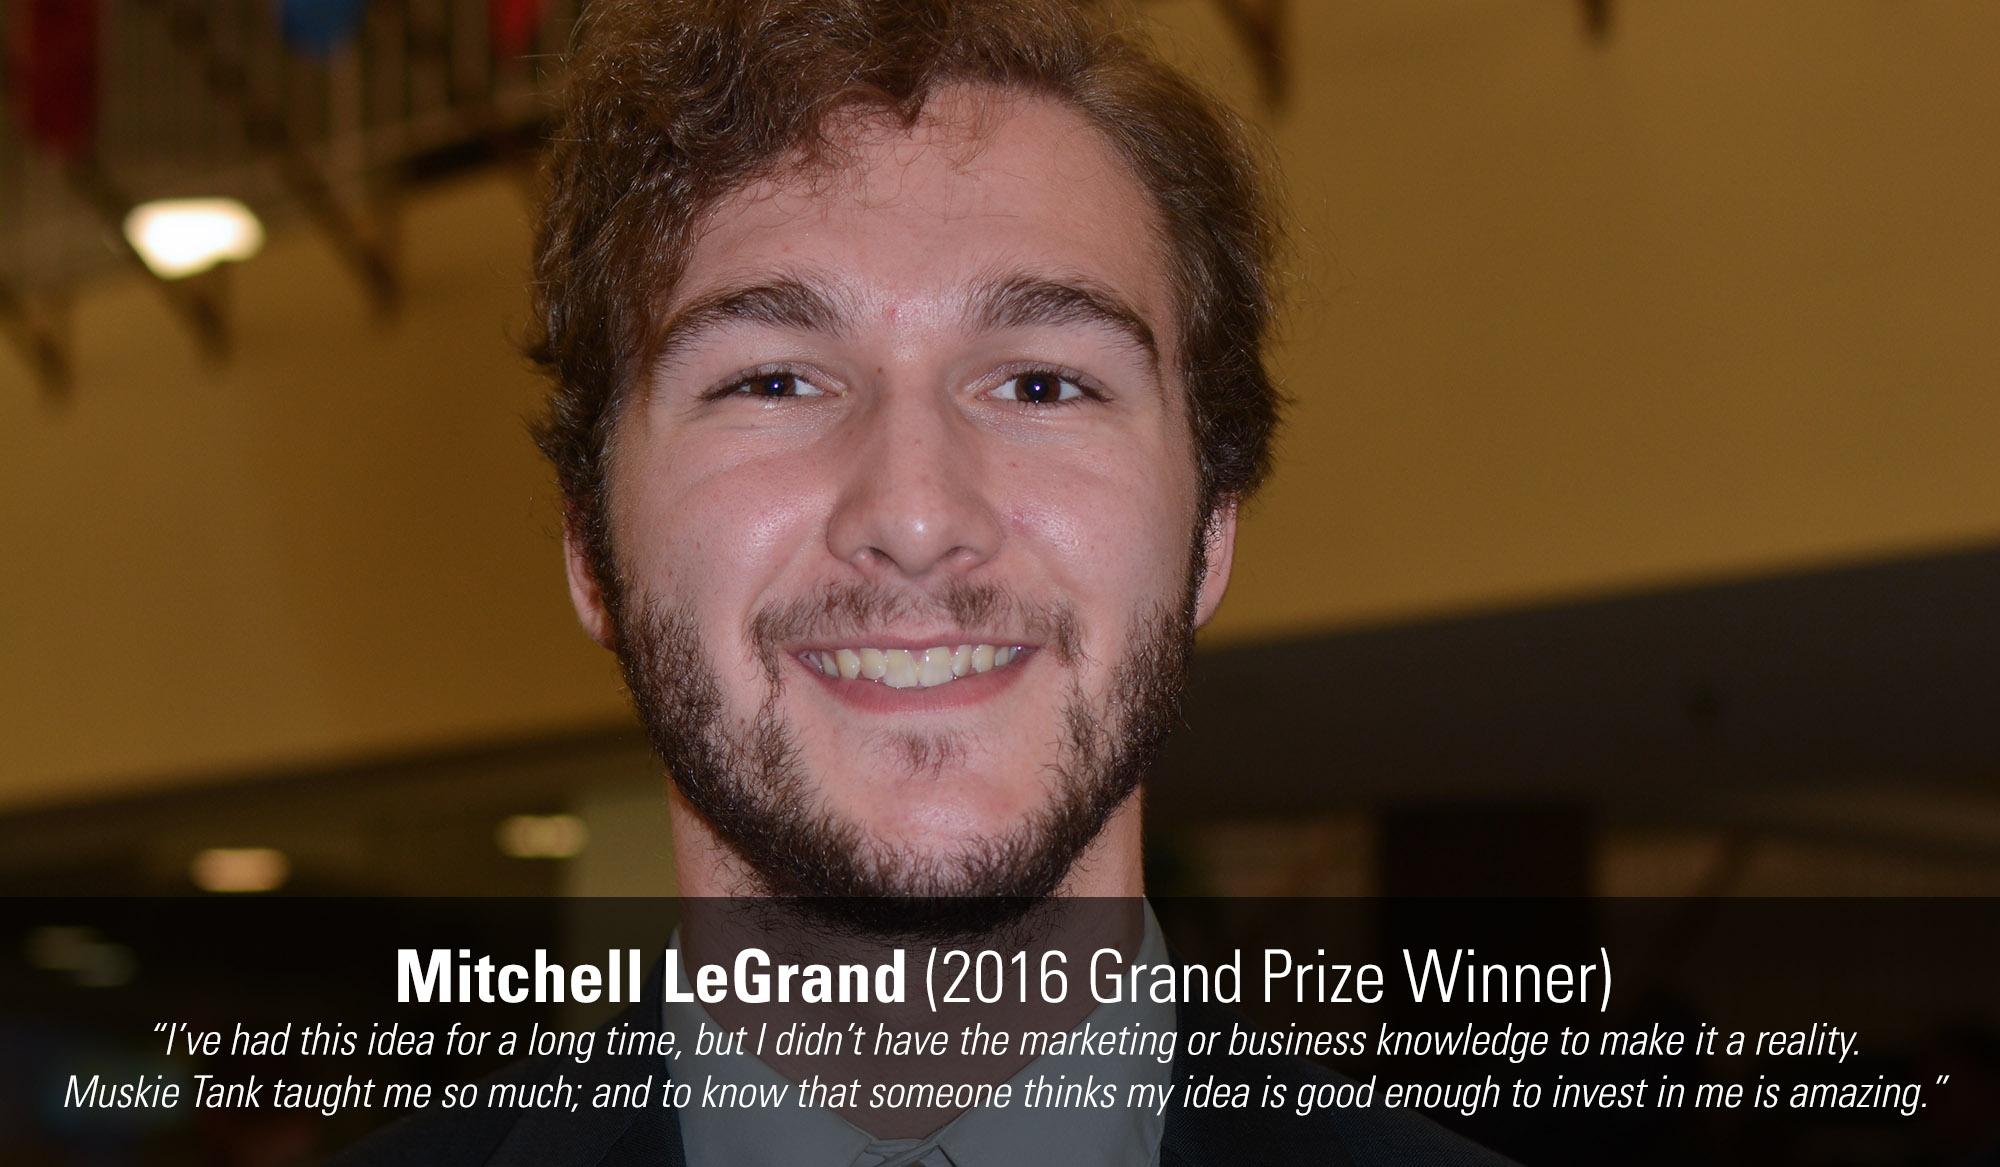 Mitchell LeGrand